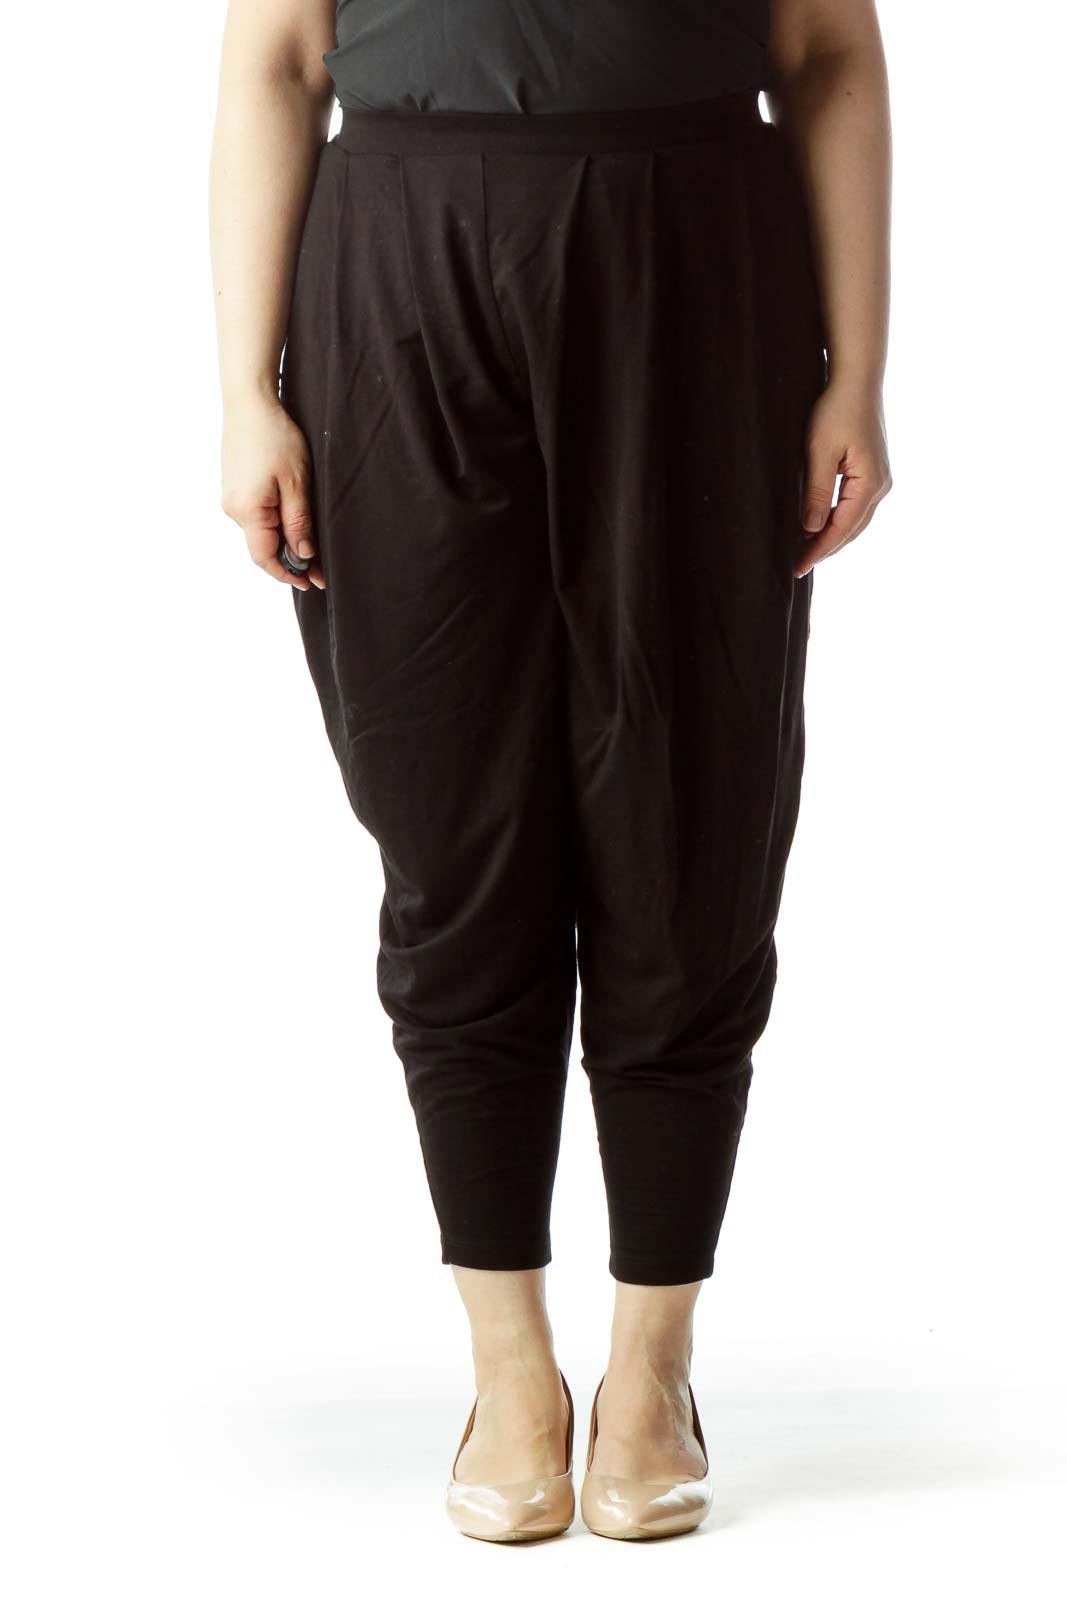 Black Elastic Band Stretch Cropped Pants